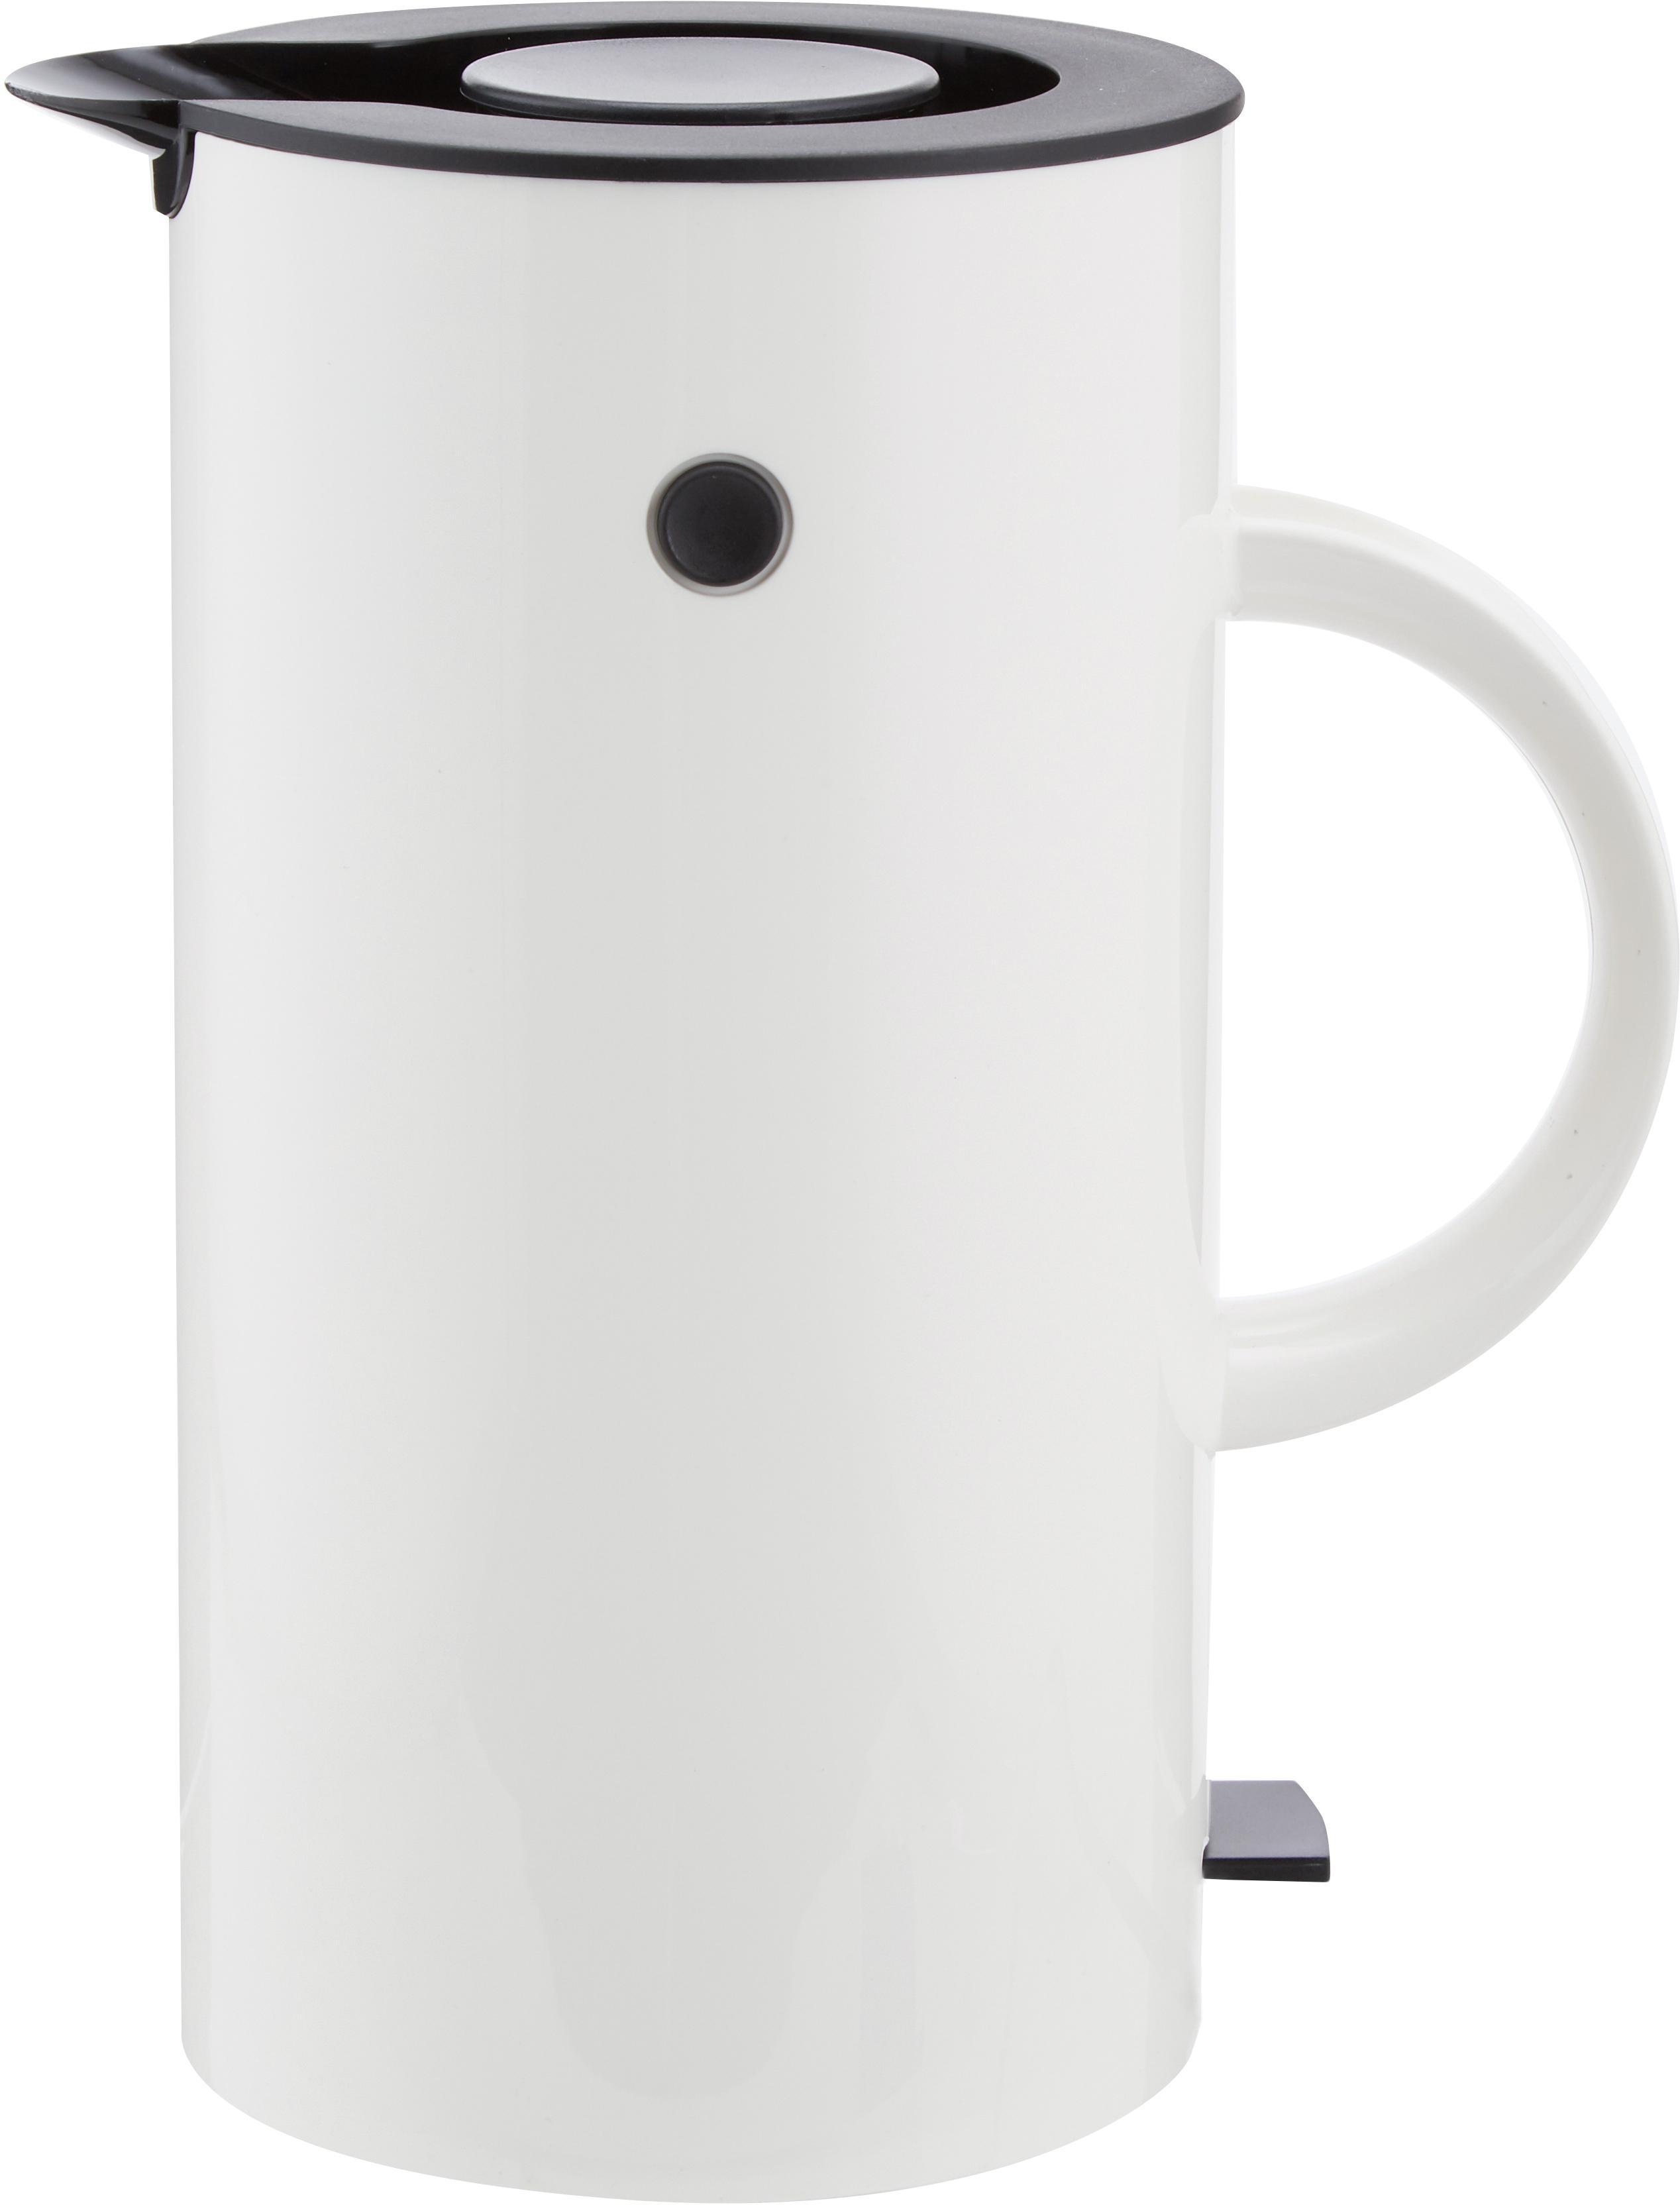 Bollitore elettrico in bianco lucido EM77, Bianco, nero, 1,5 L